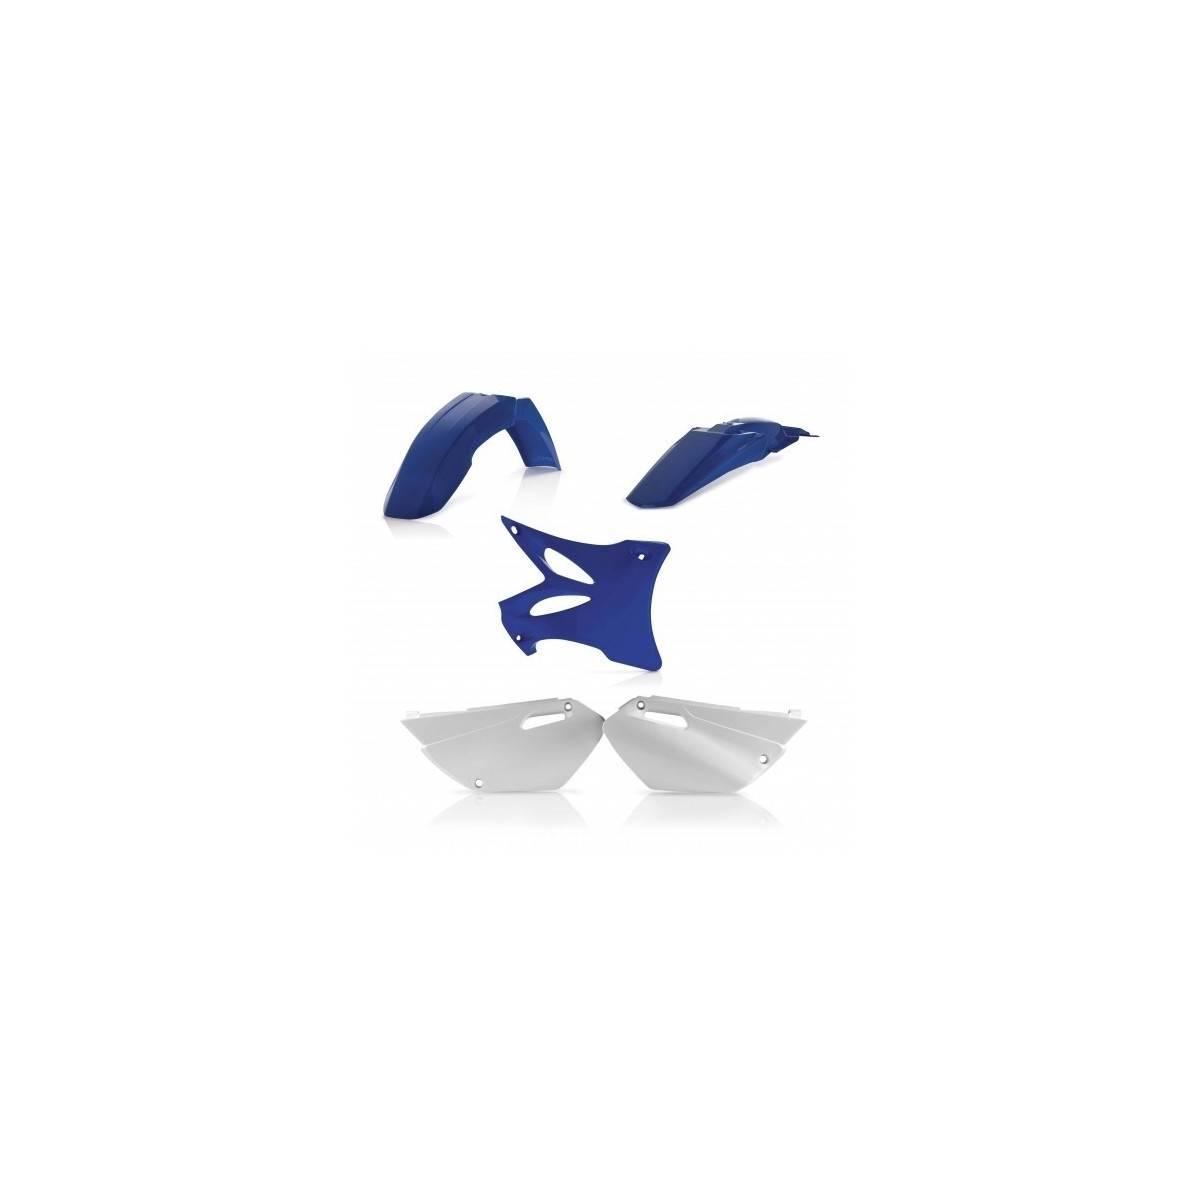 0010304-553 - Kit Plasticos Wrf 250 06 Wrf 450 06 Origen